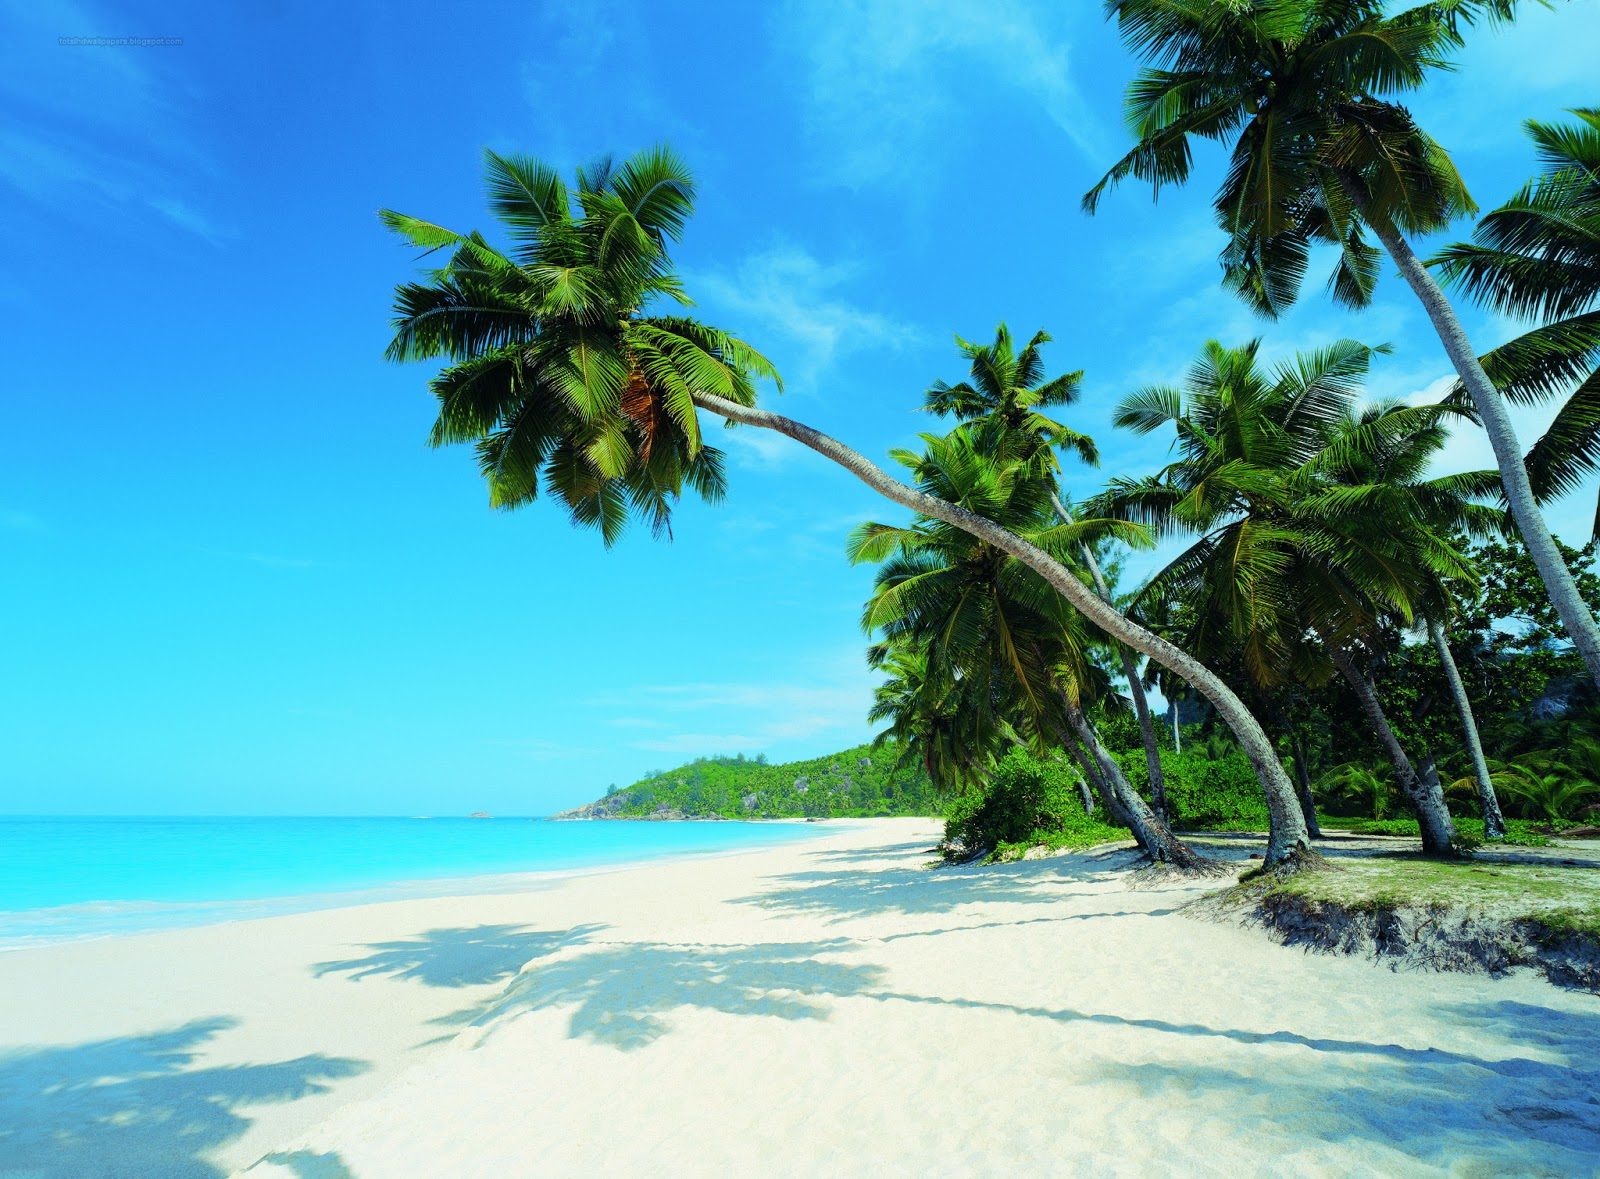 Tropics Palm Trees Sun Beach 4k Hd Desktop Wallpaper For: HD Wallpapers: Palm Tree Wallpapers Hd